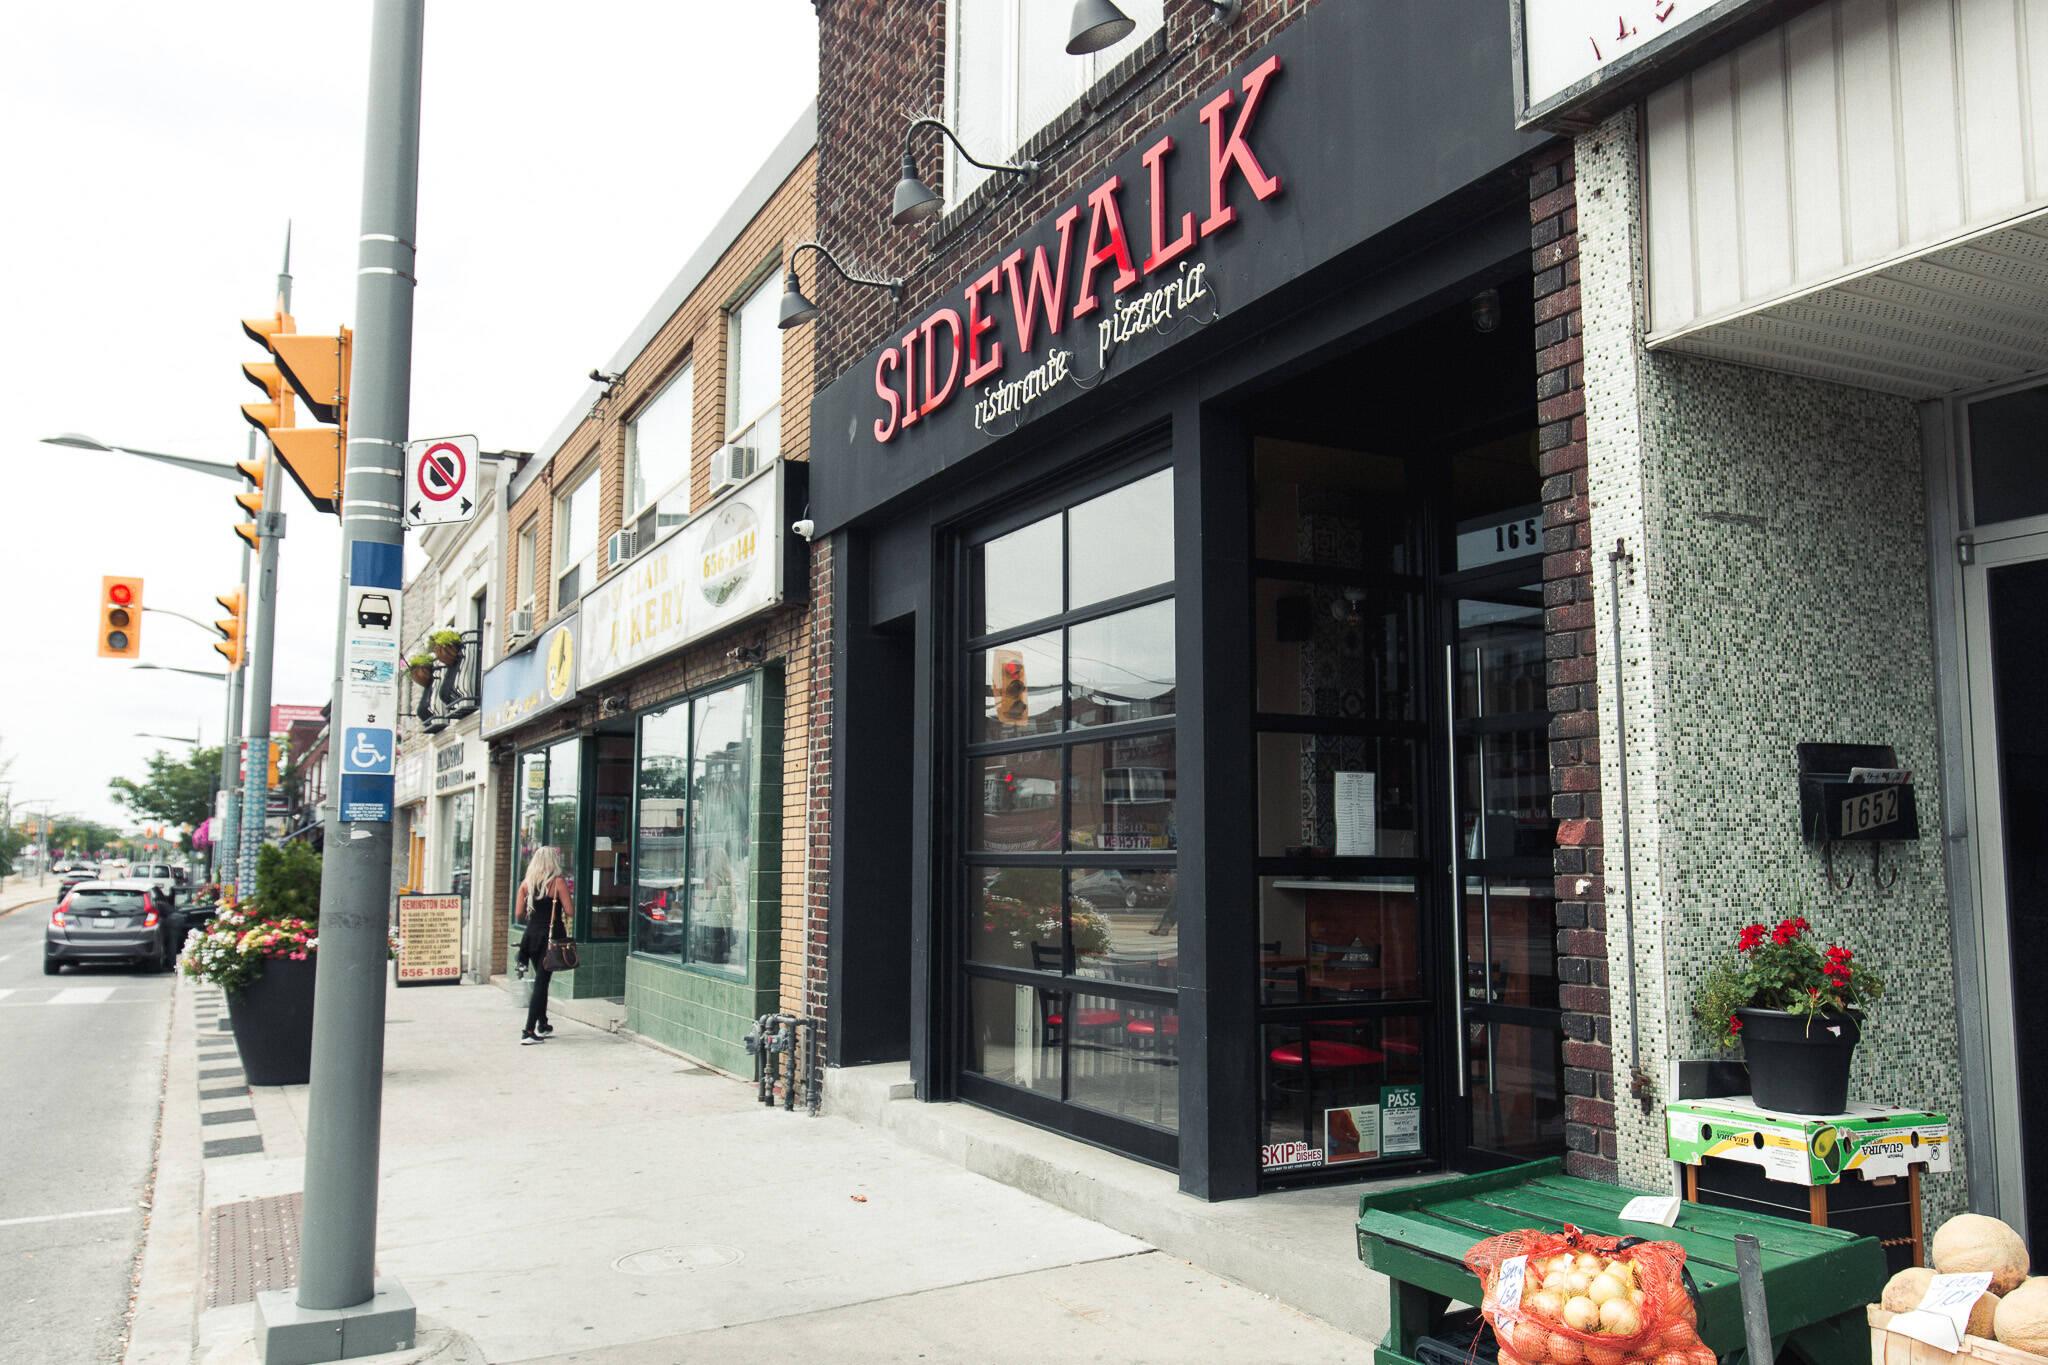 Sidewalk pizza Toronto